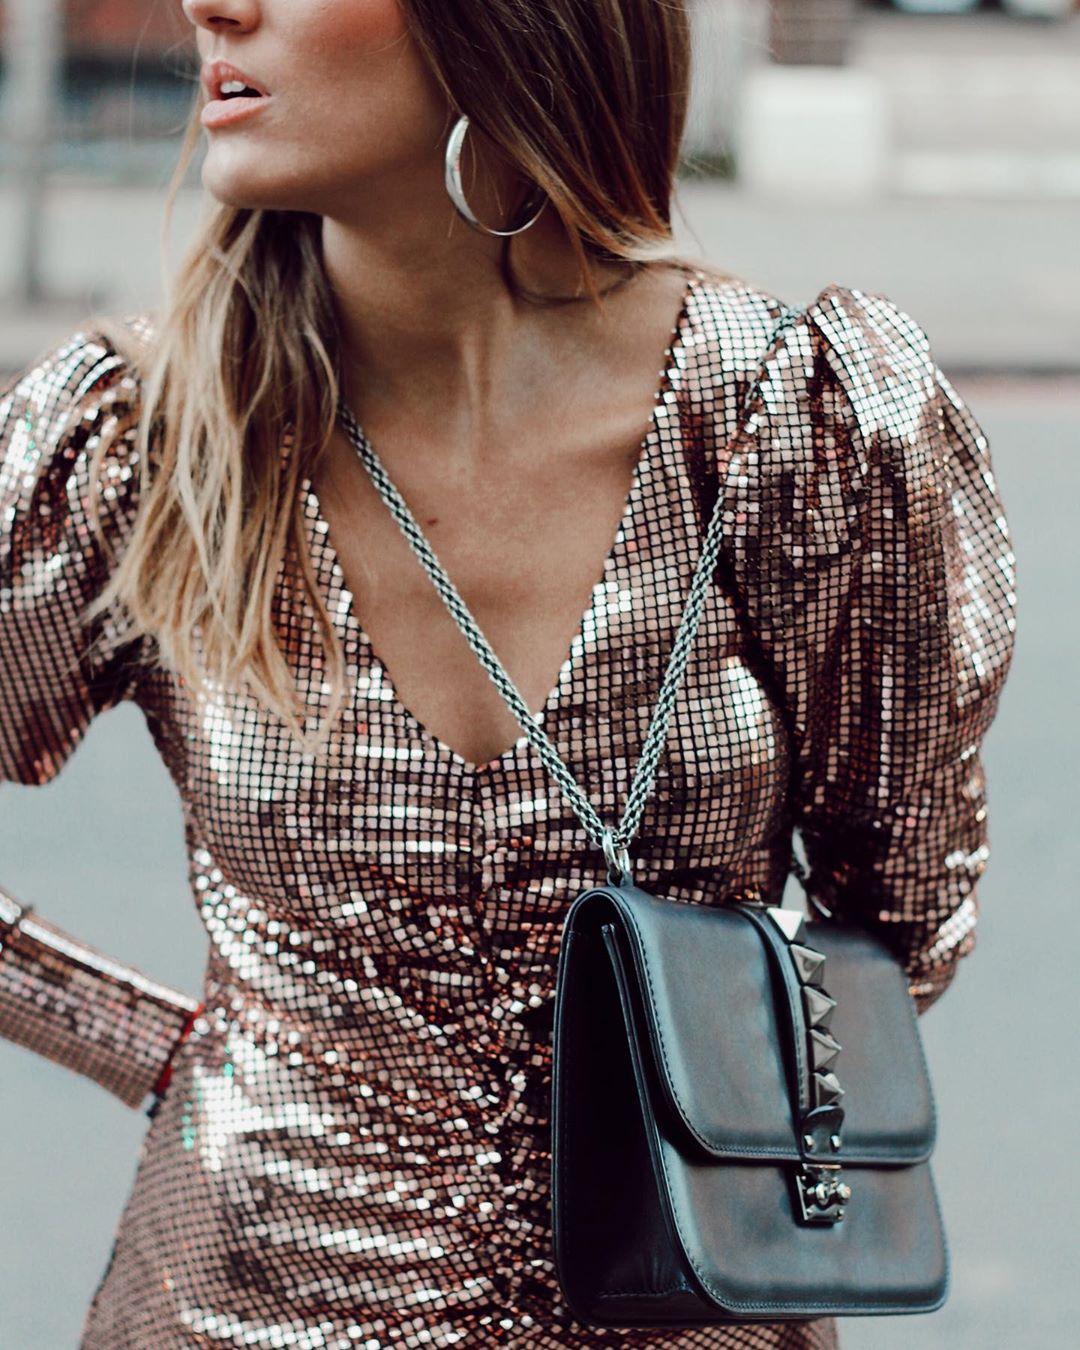 dress with ruching and rhinestones de Zara sur natichualcantara